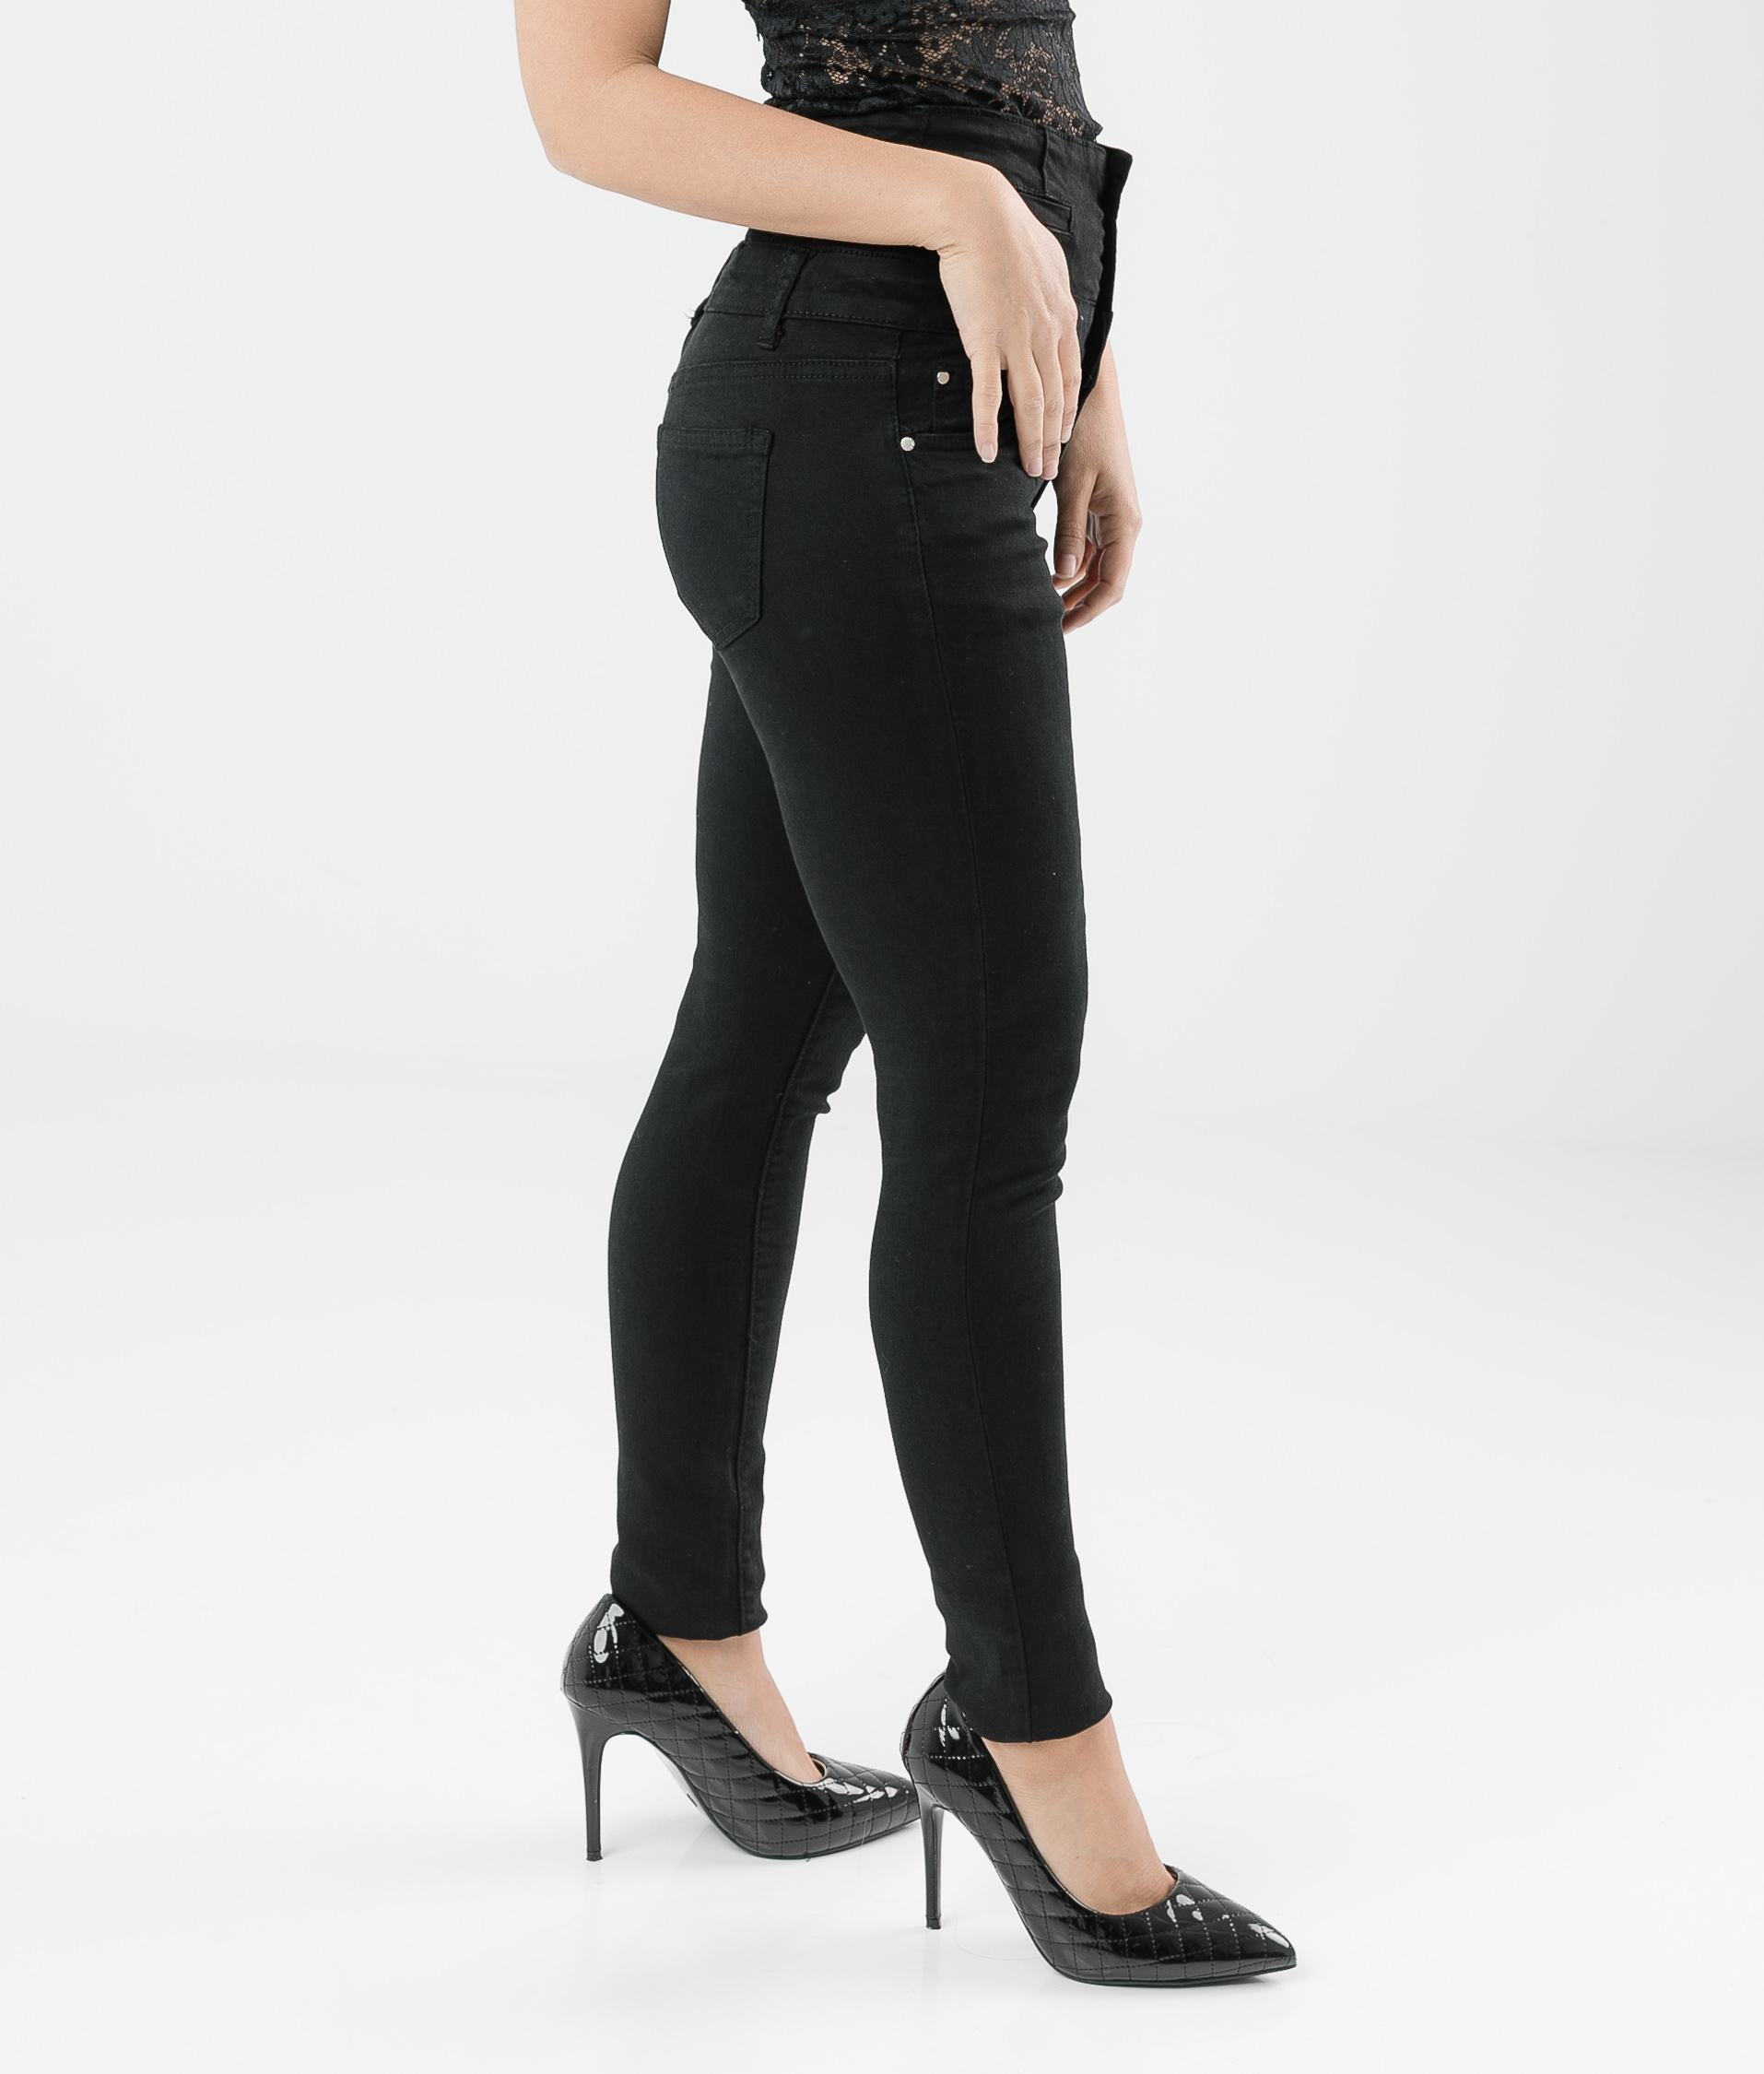 Pantalón CHERYL - Black